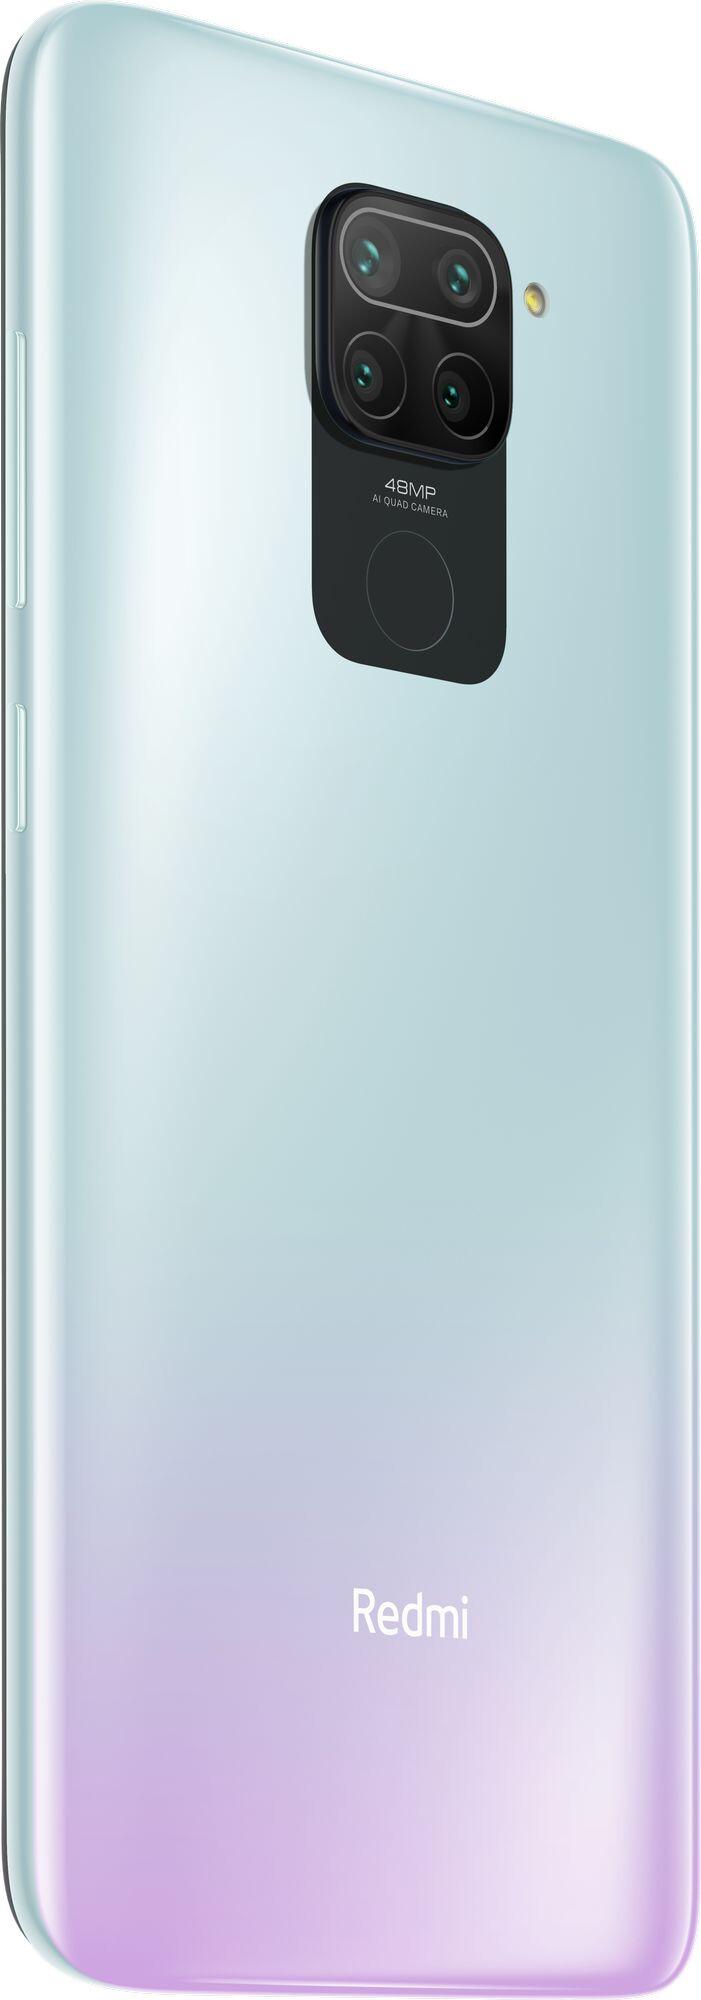 Xiaomi Redmi Note 9 3GB/64GB White - 4